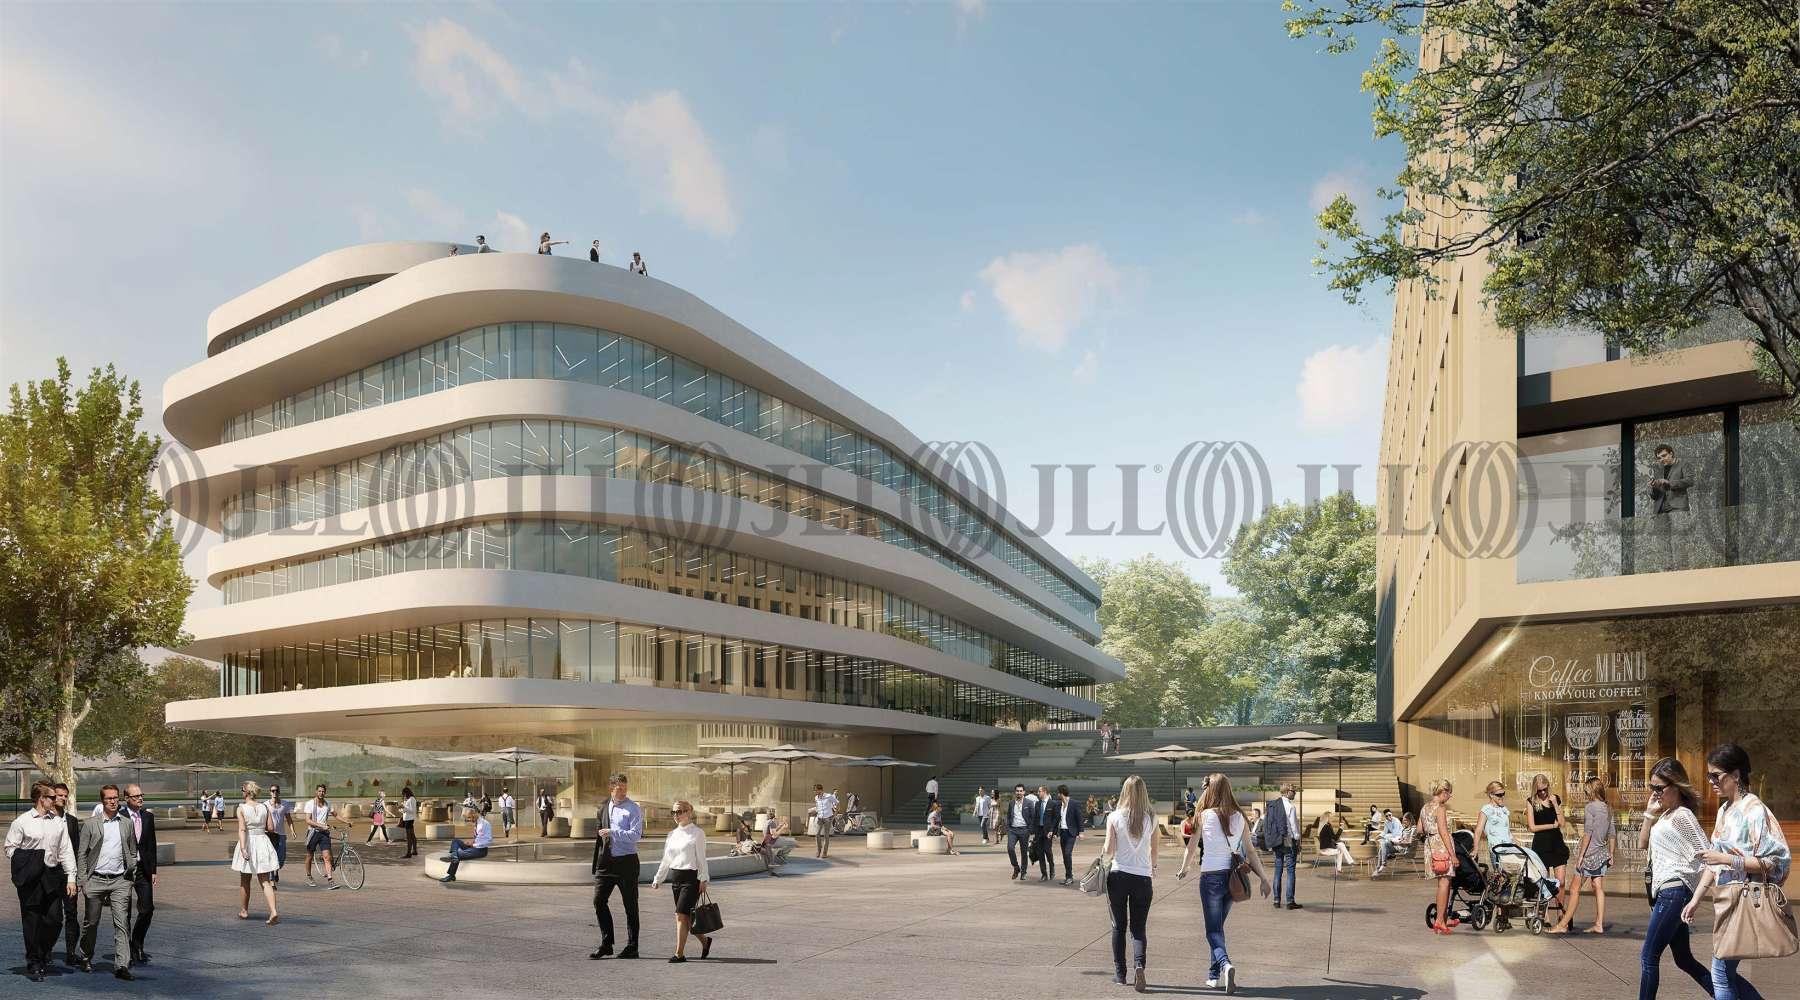 Büros Bad homburg, 61352 - Büro - Bad Homburg - F2314 - 9501633